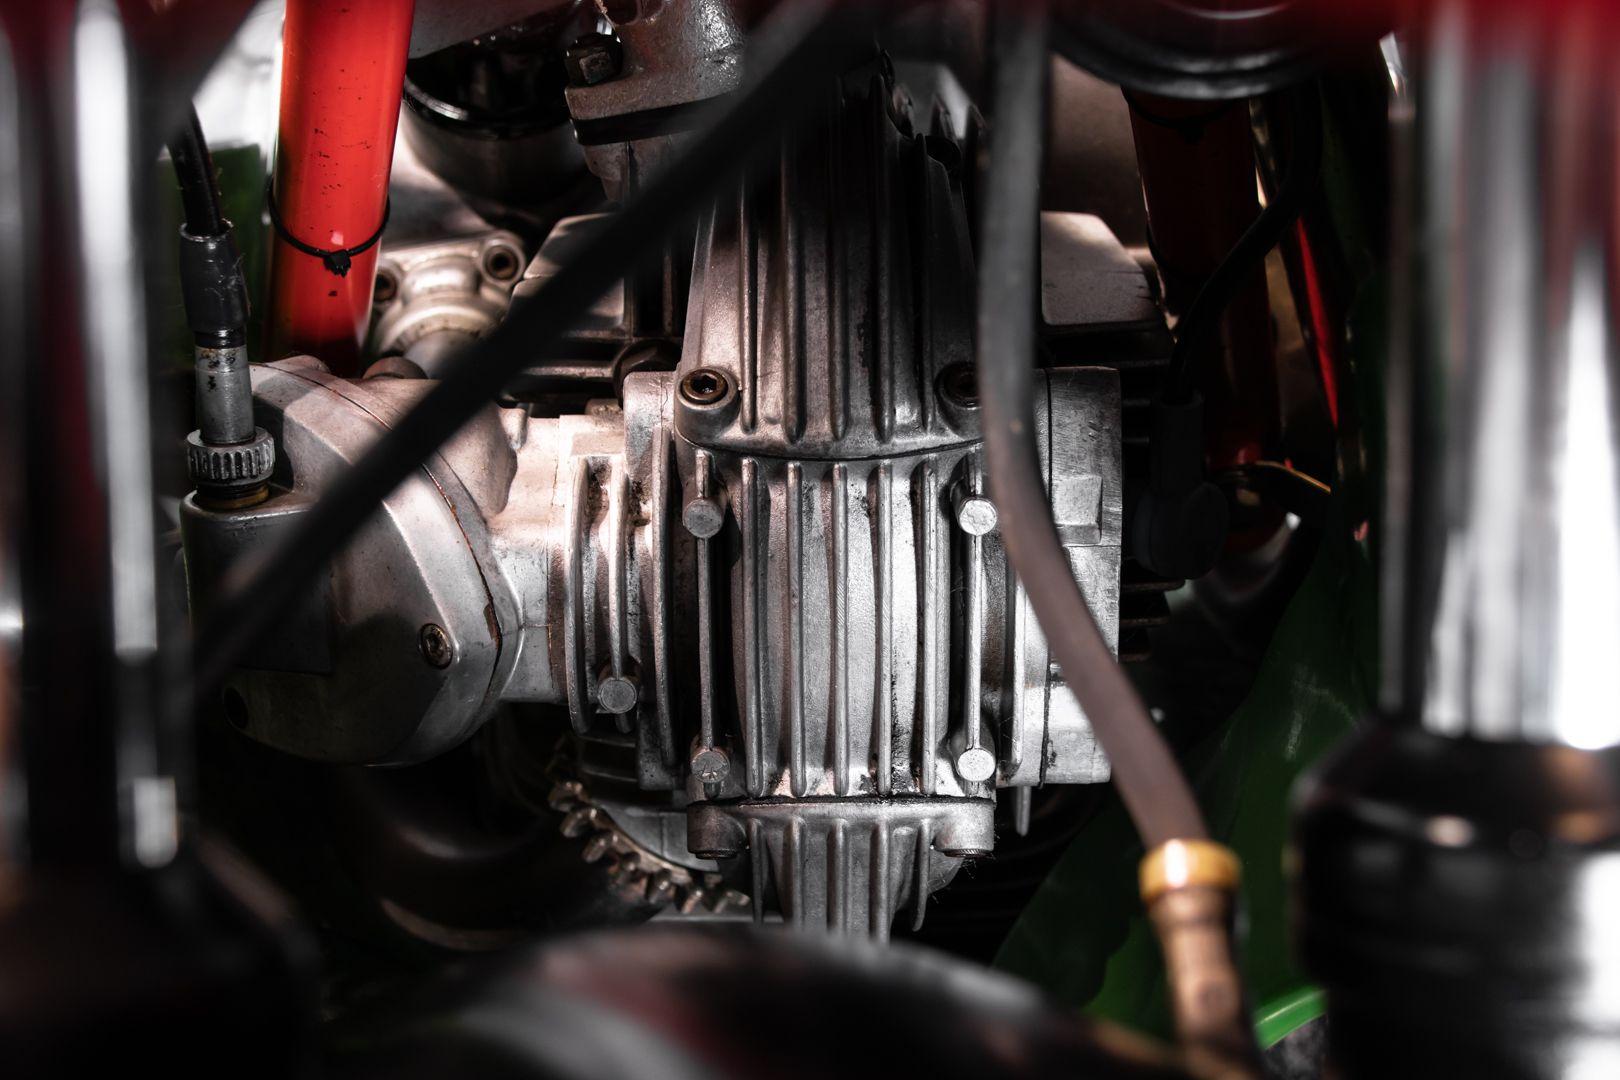 1983 Ducati 900 Mike Hailwood Replica 71439